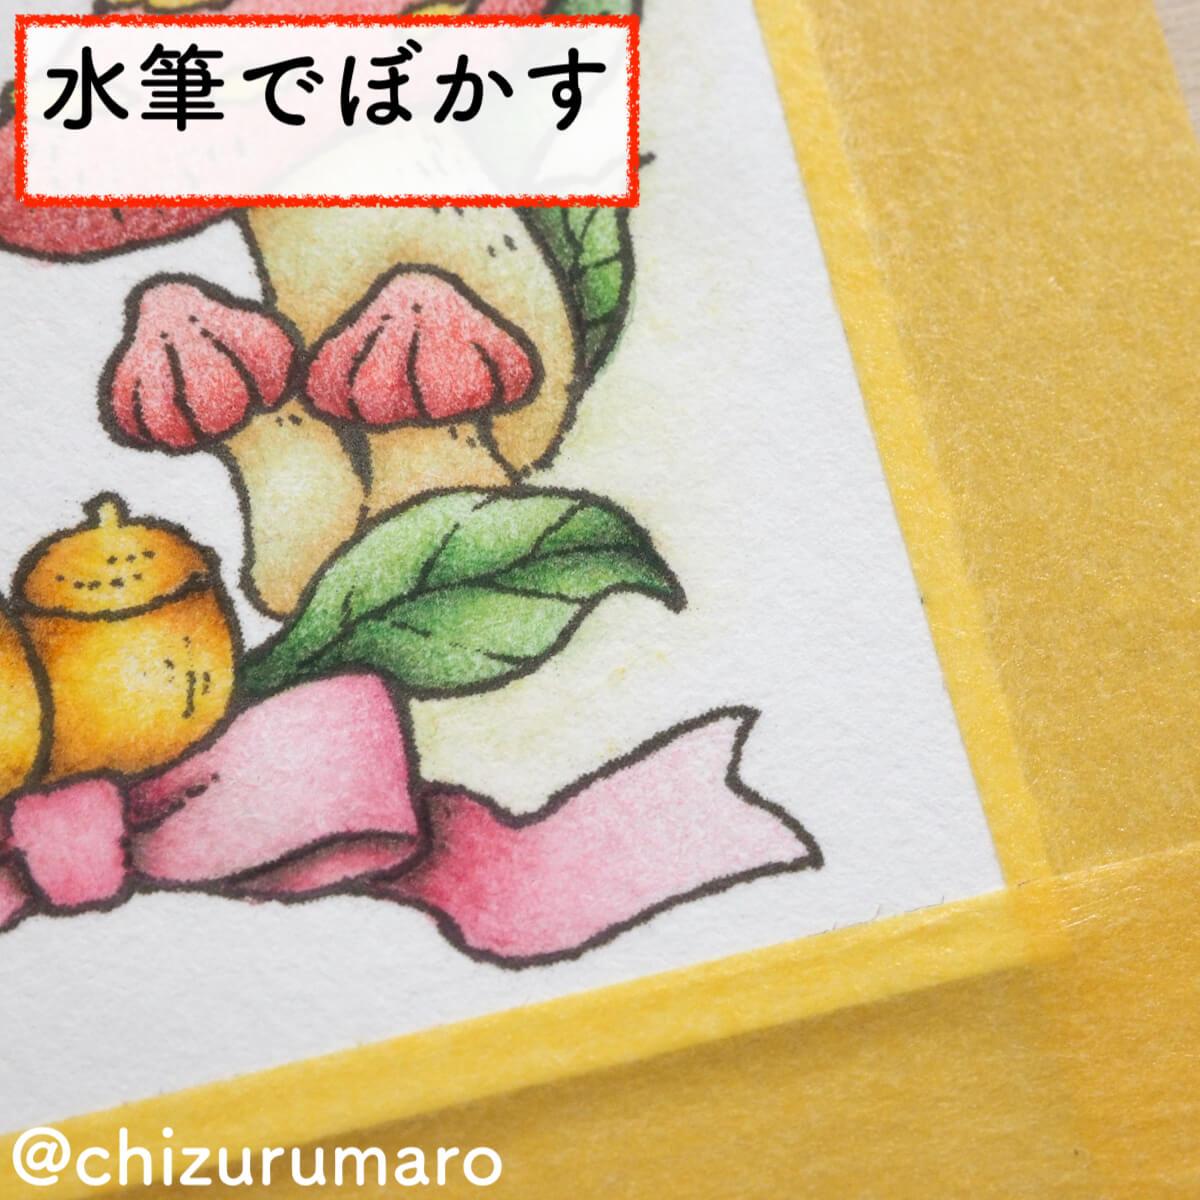 f:id:chizurumaro:20200218160806j:plain